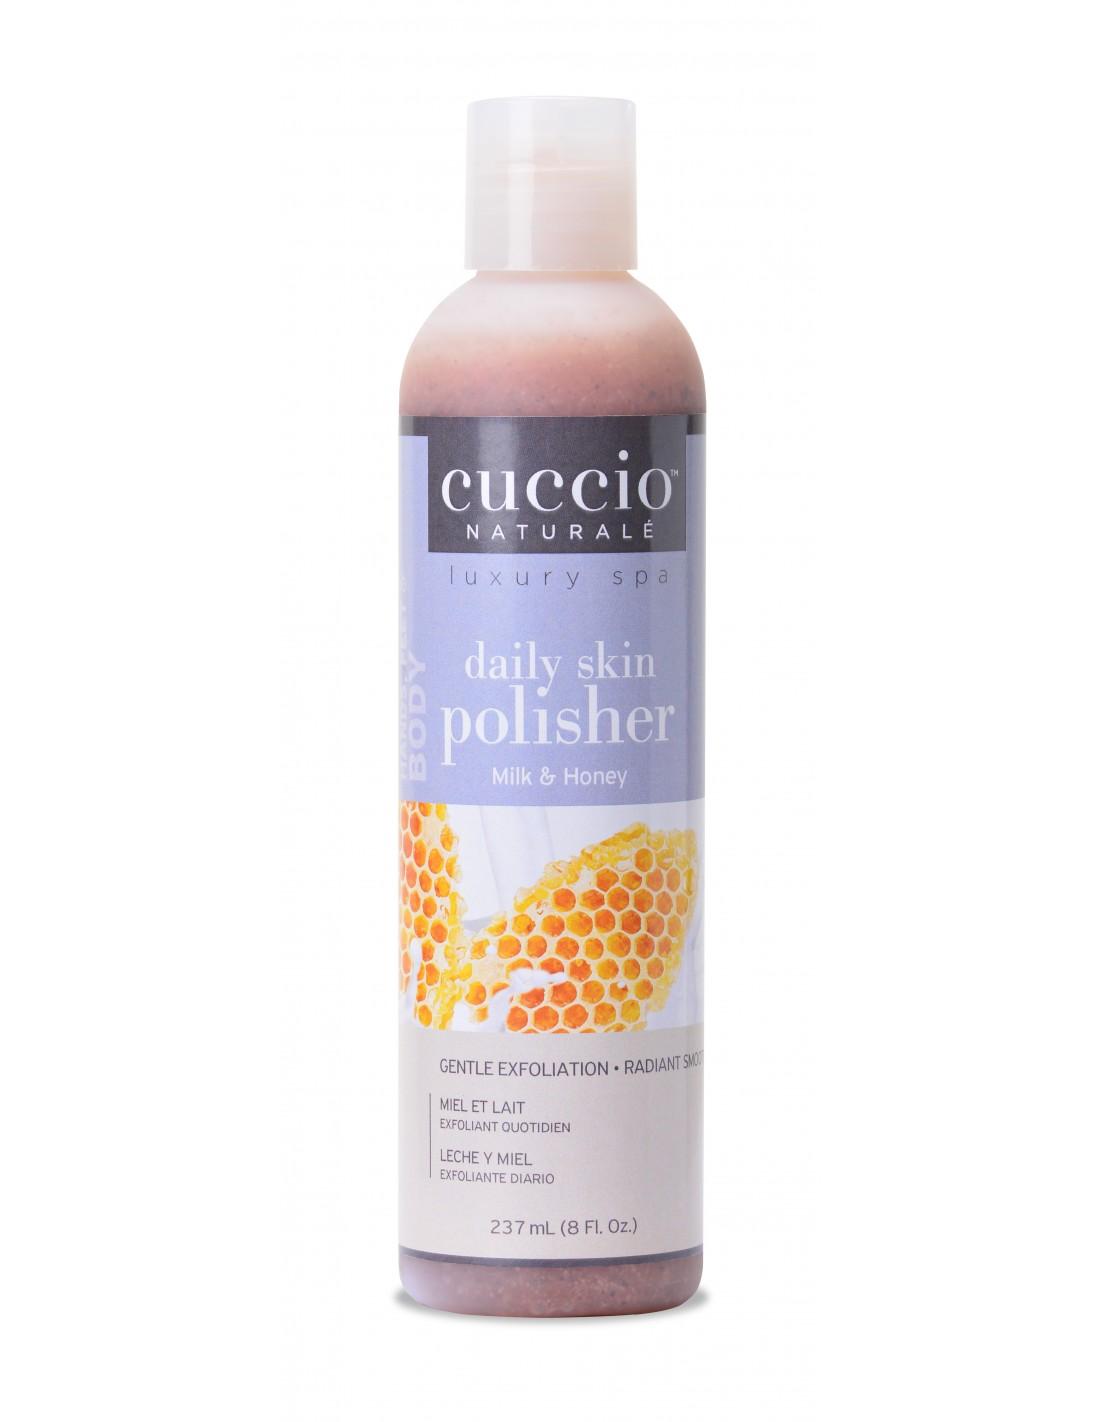 Esfoliante Cuccio - Daily Skin Polisher  - Milk and Honey - 237ml - CNSC3405